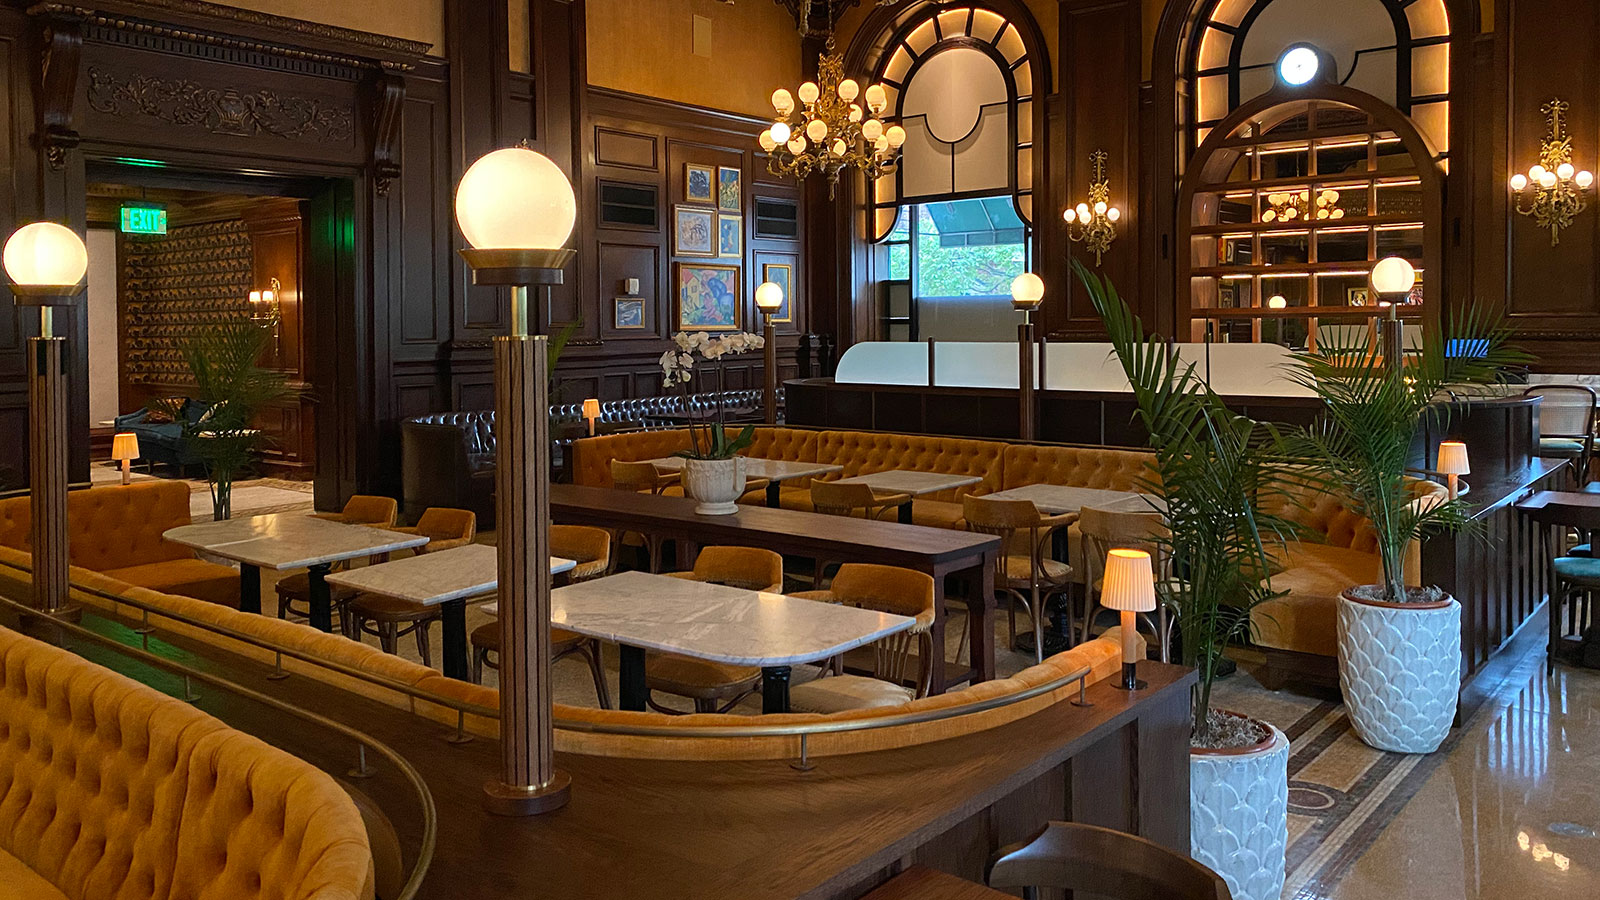 Image of Le Cavalier Restaurant, HOTEL DU PONT, Wilmington, Delaware, Dining